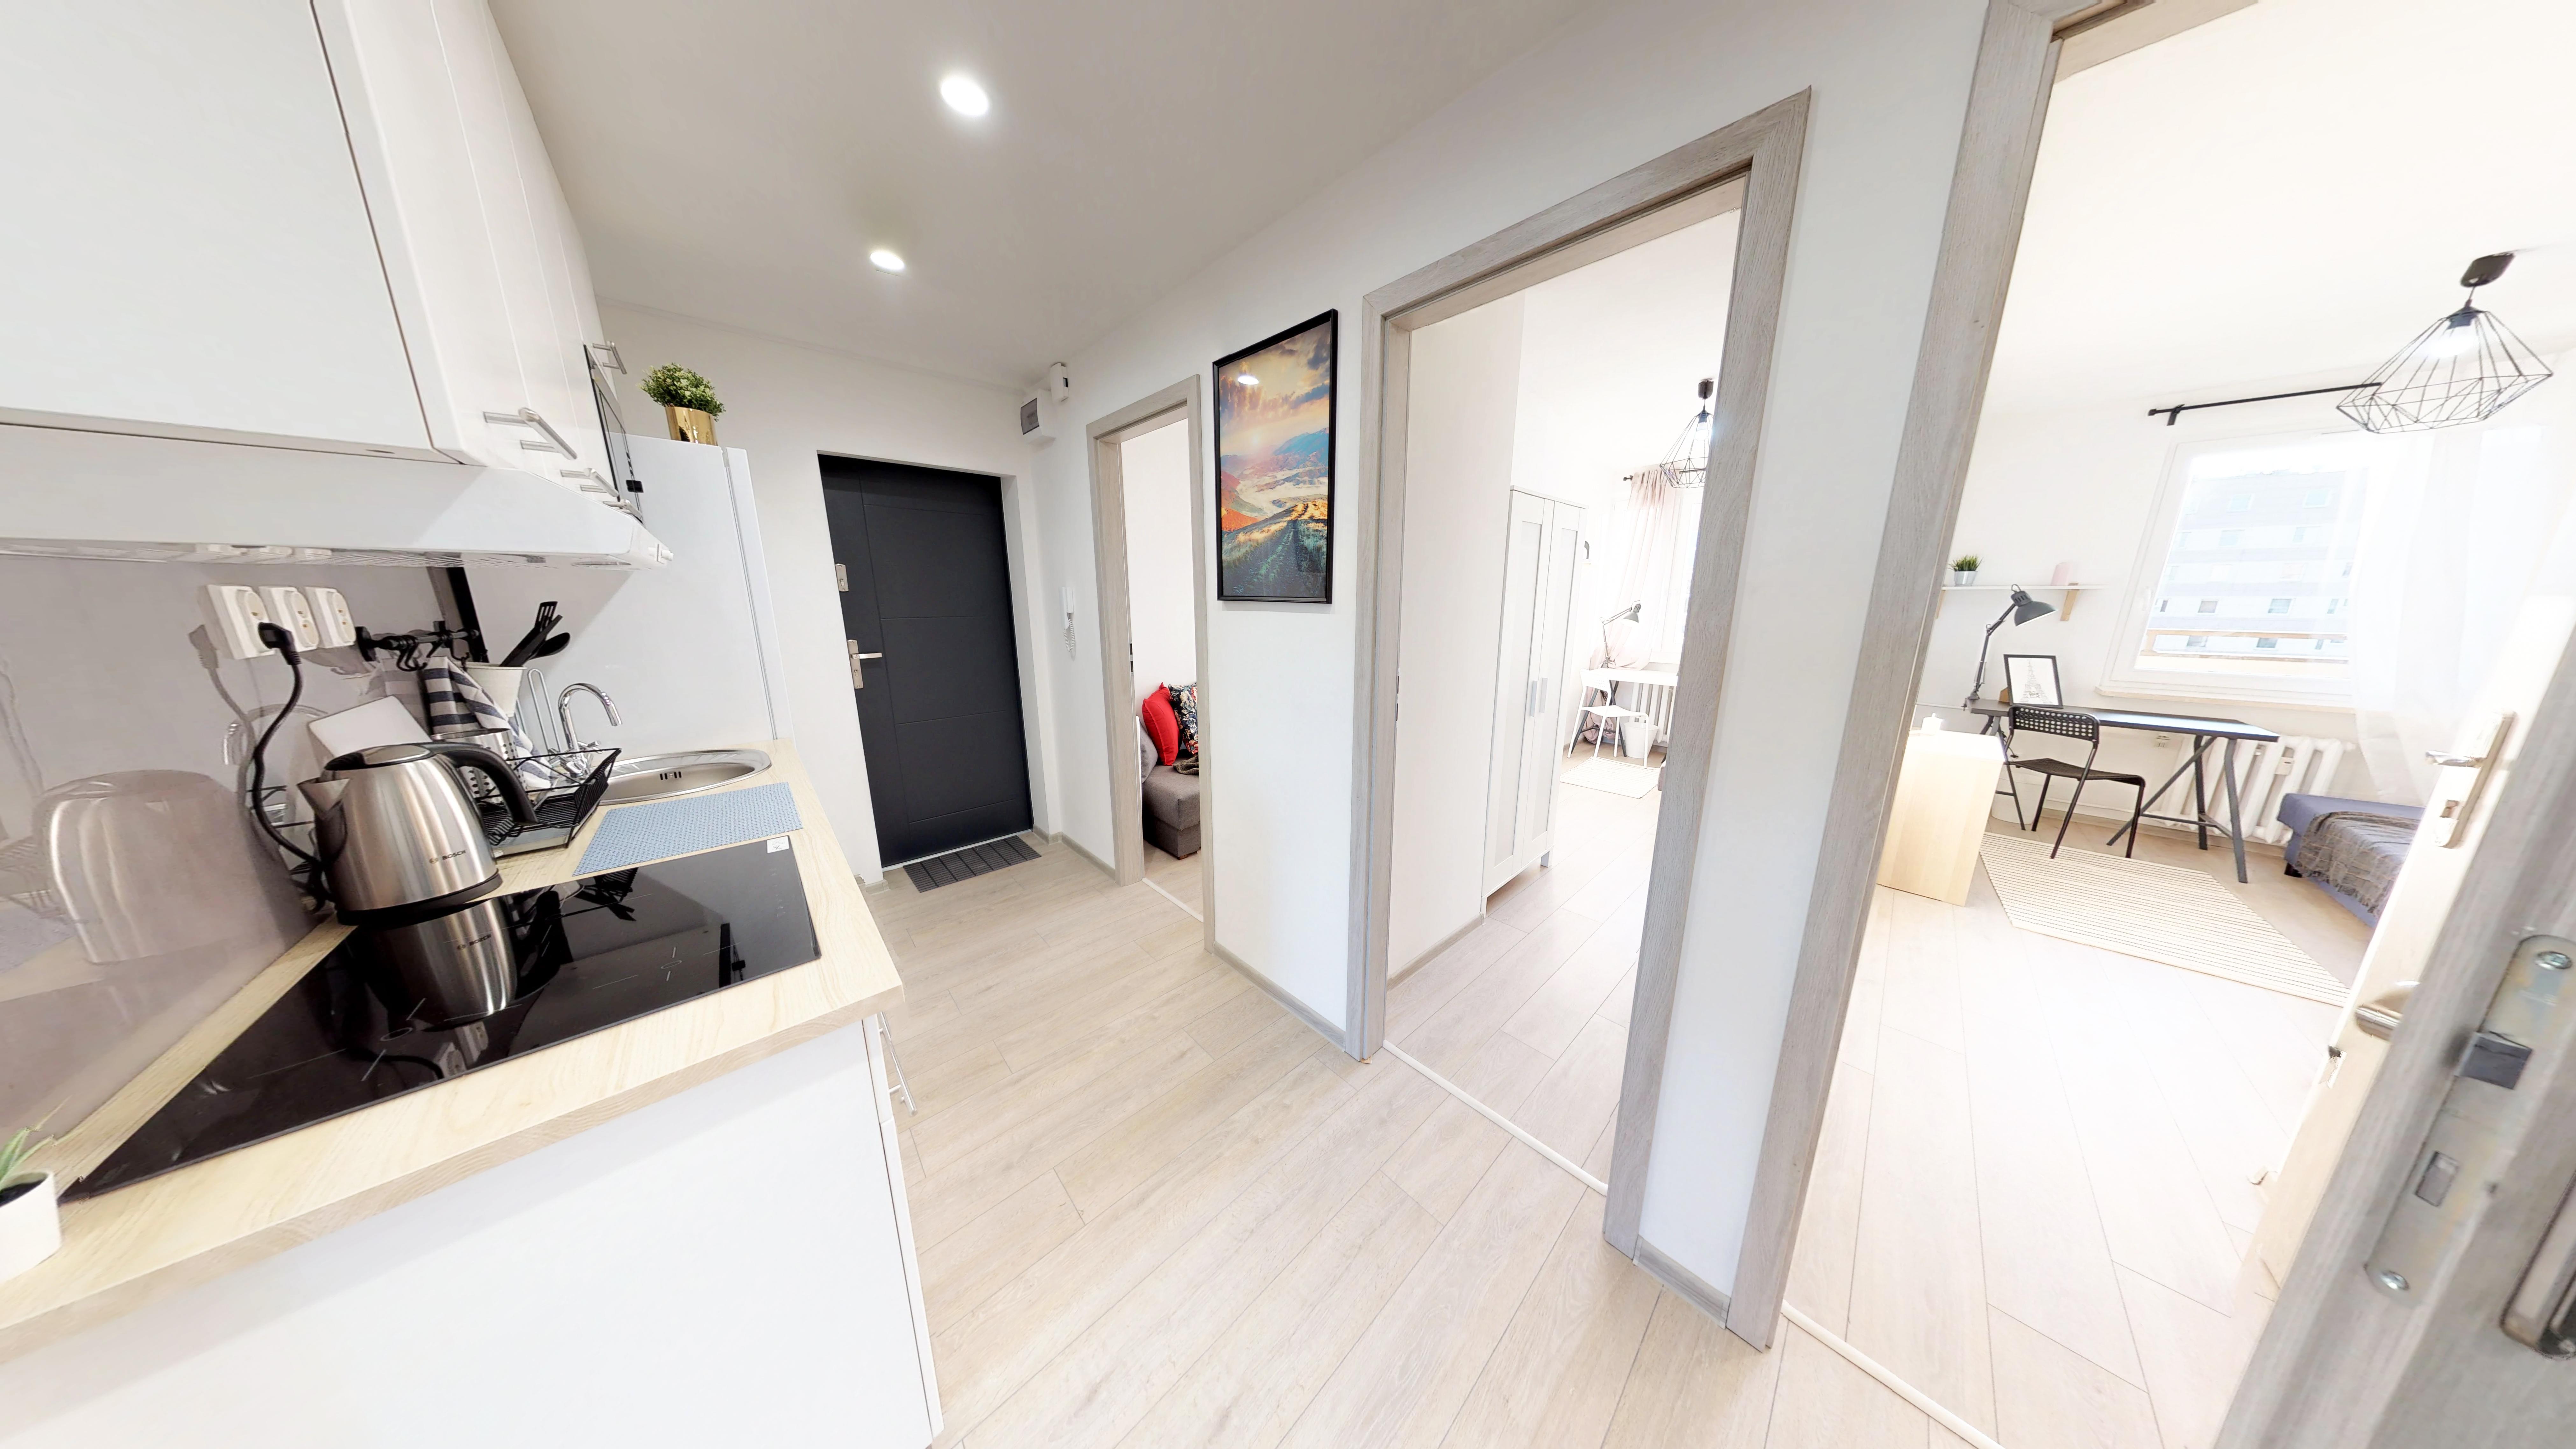 wirtualny spacer mieszkanie po remoncie